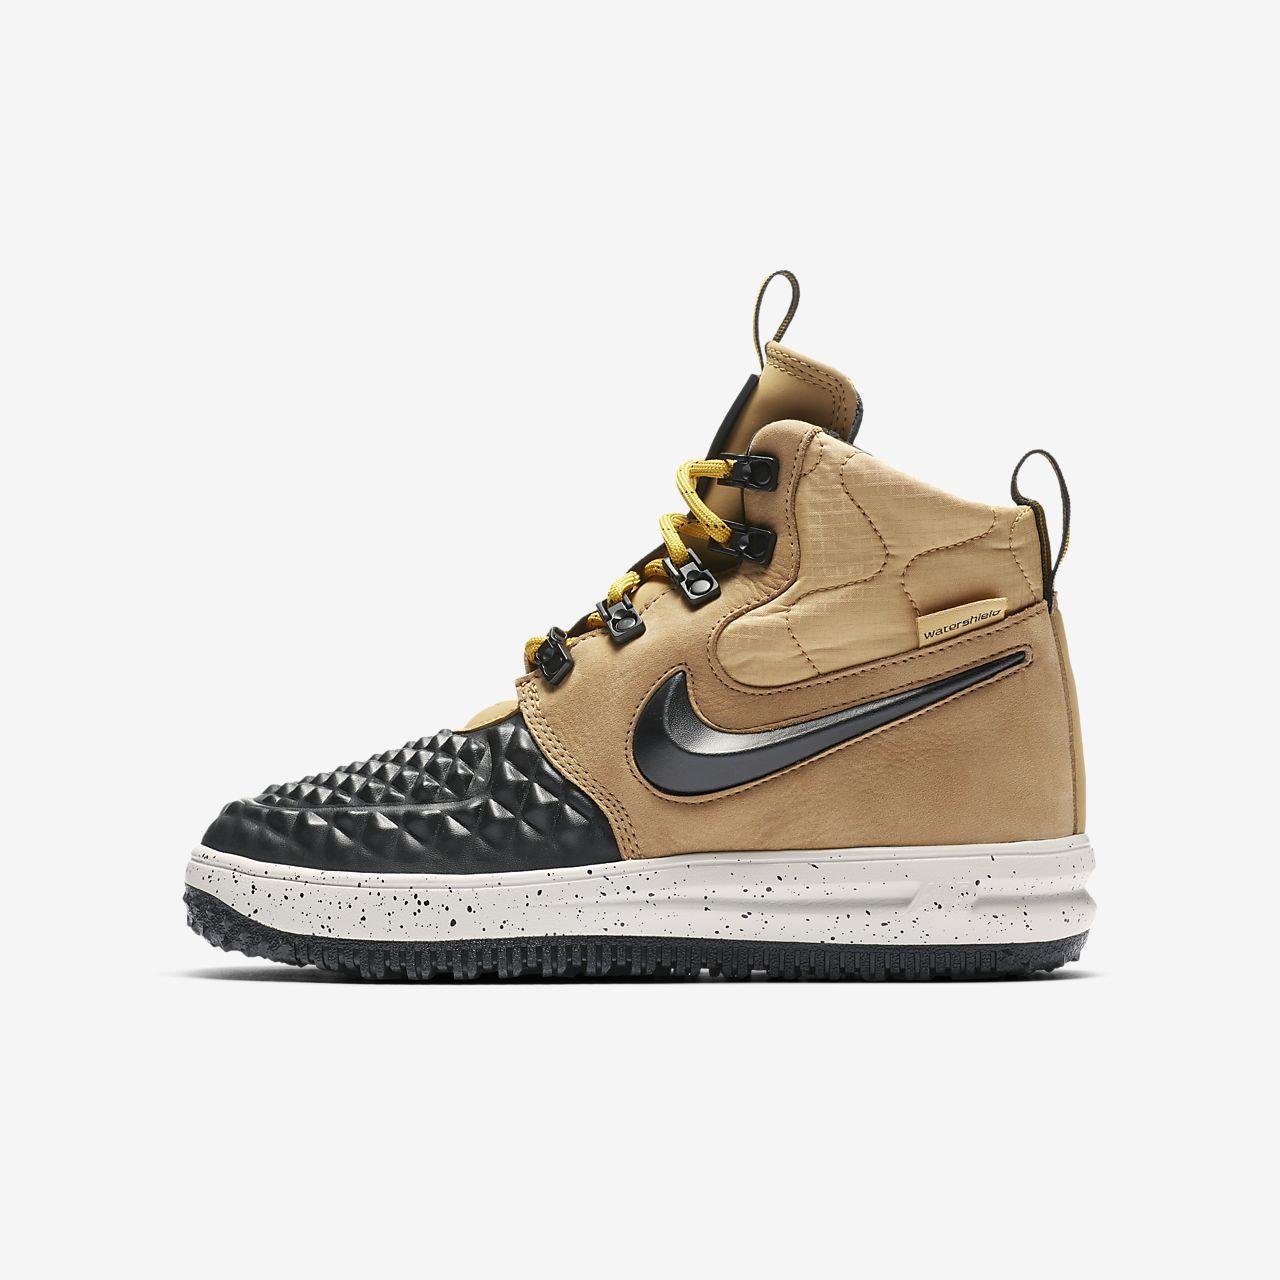 low cost 136b5 15b8c ... Nike Lunar Force 1 Duckboot 17 høy sko for store barn